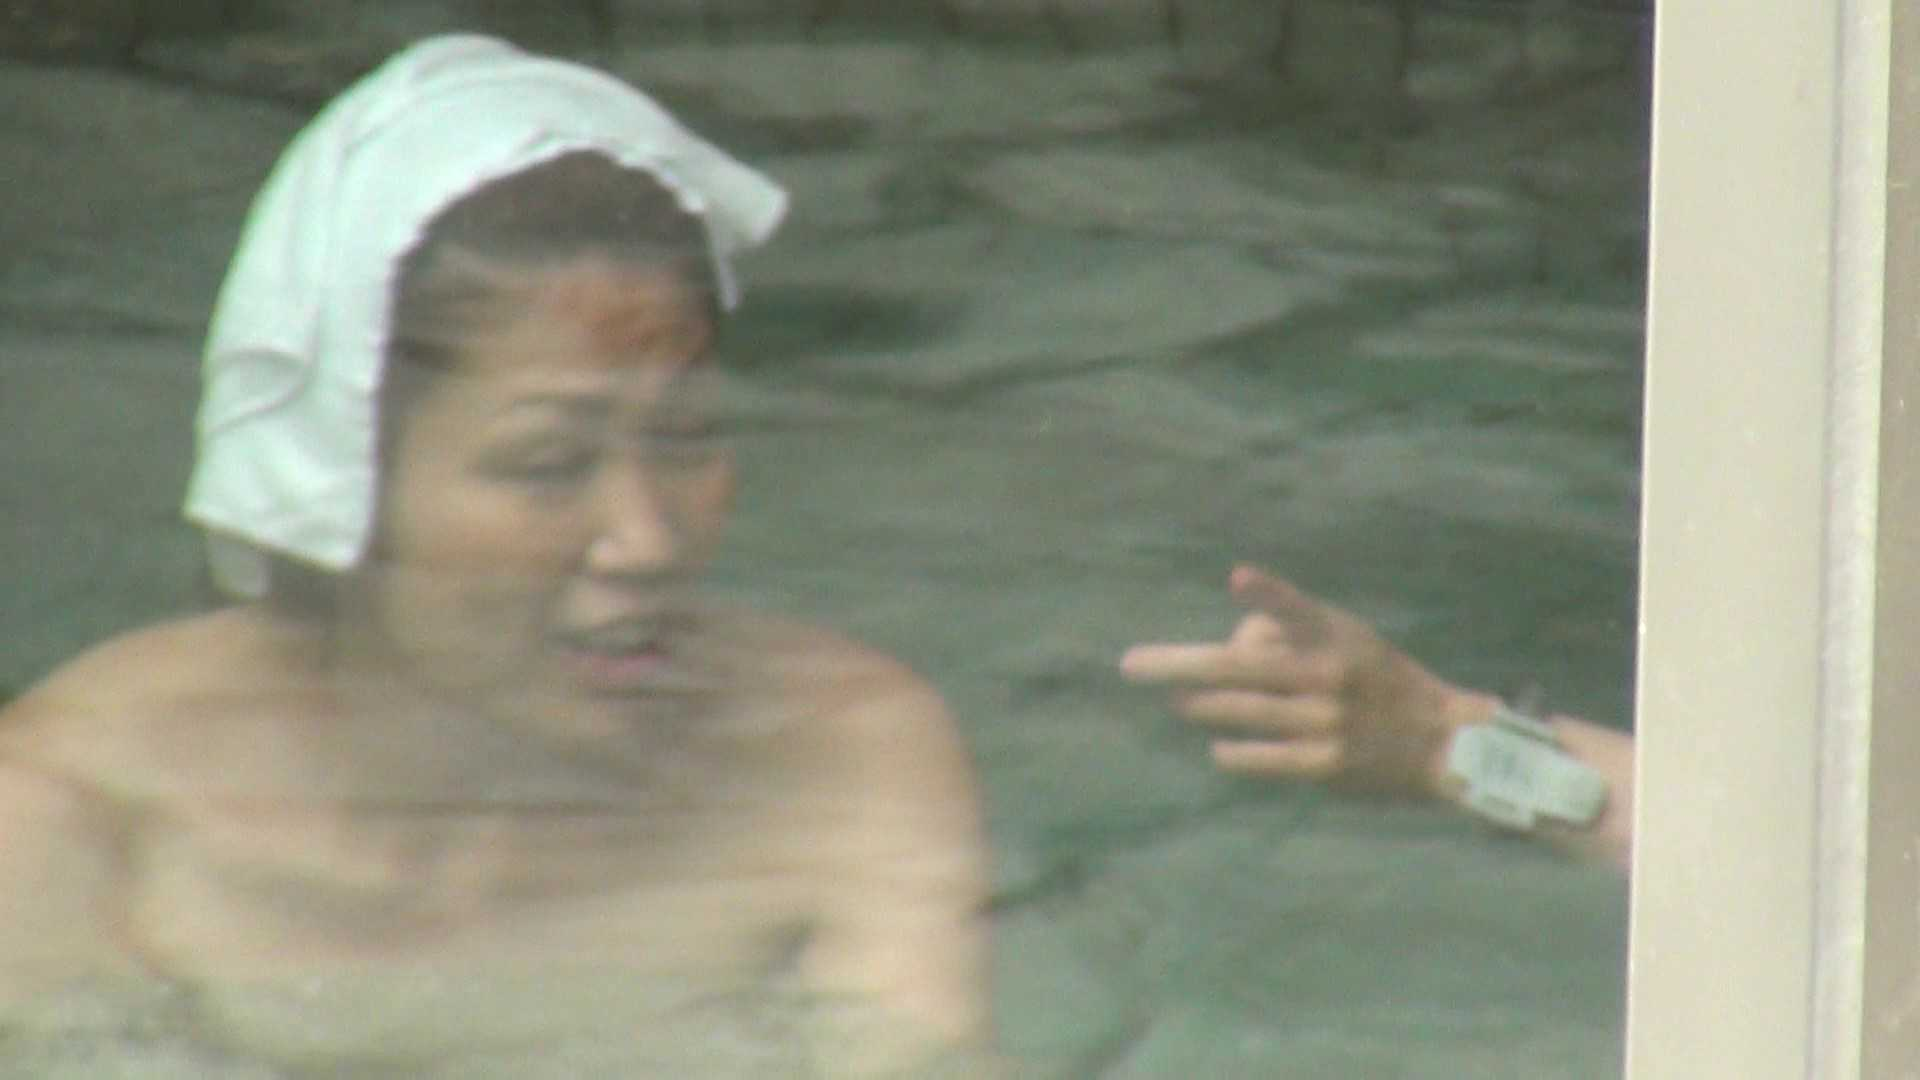 Vol.65 波平陰毛 体育座りで魅惑のチラリ 潜伏露天風呂  42pic 12